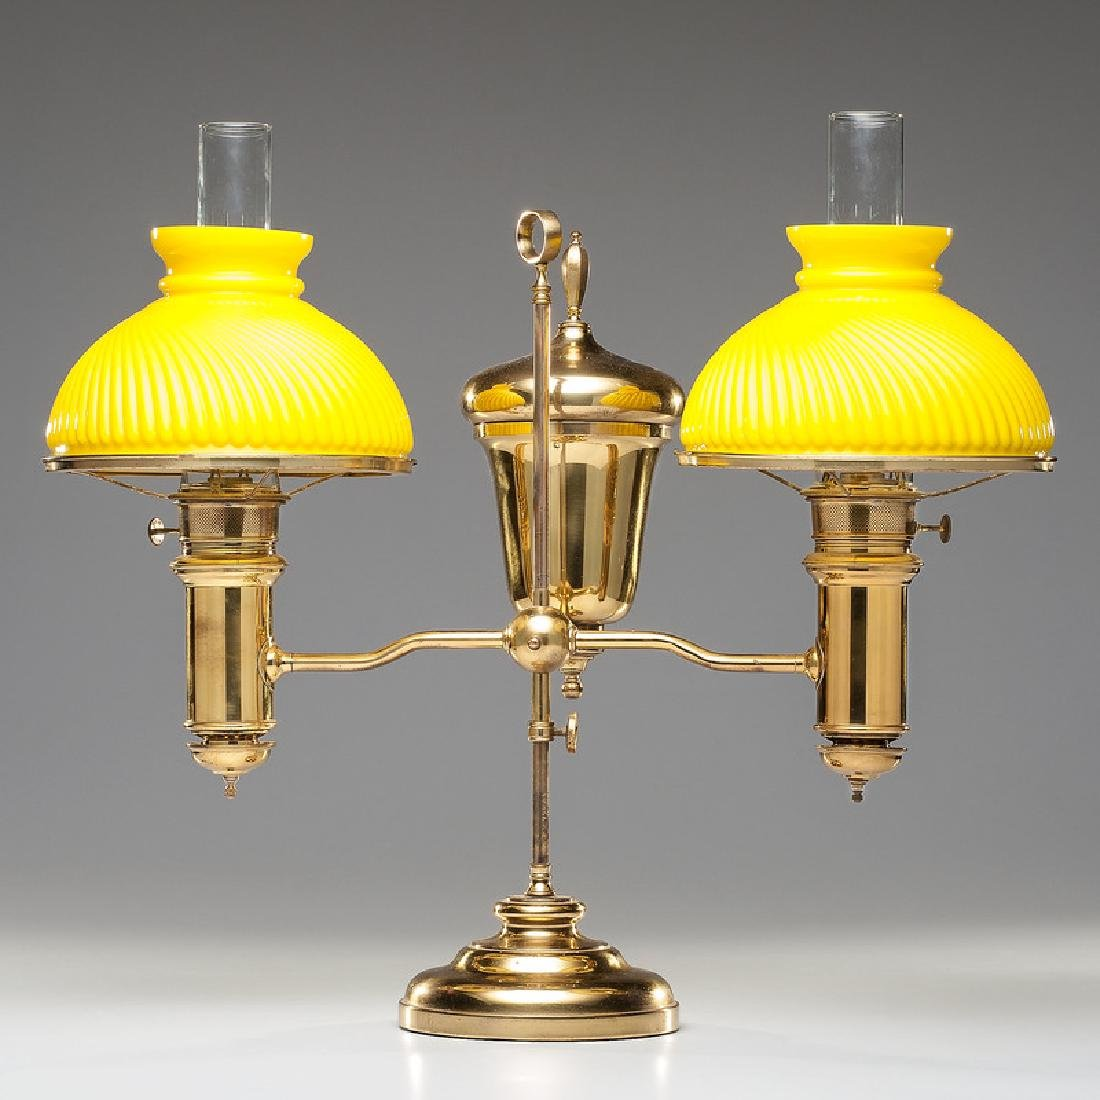 Edward Miller Double Student Lamp